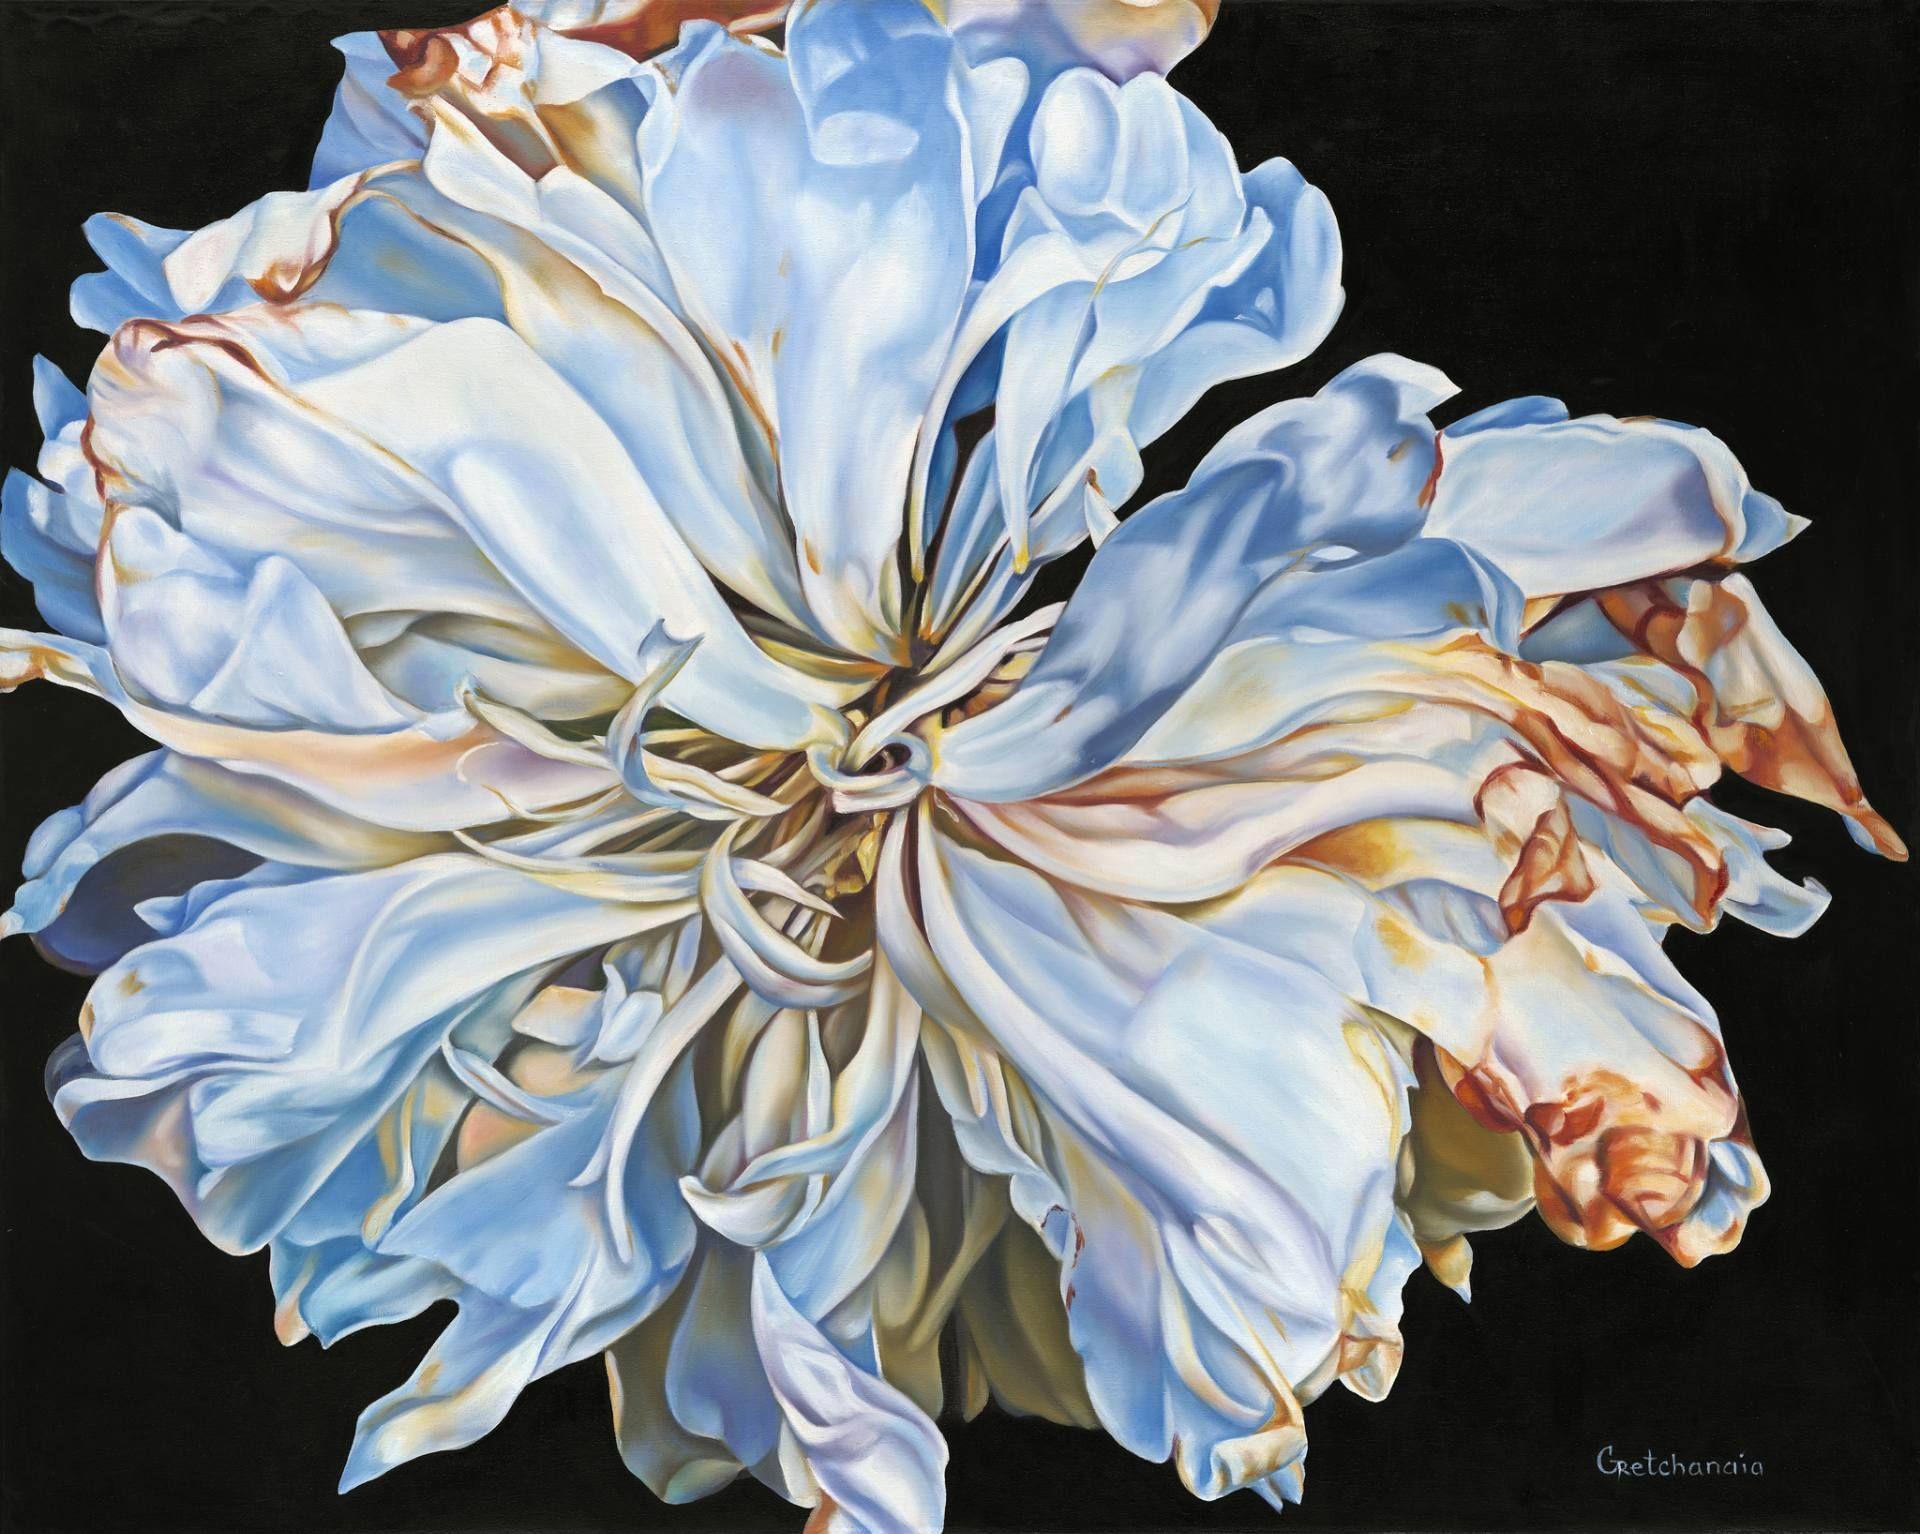 Exhilaration Limited Edition Art Print By Irina Gretchanaia With